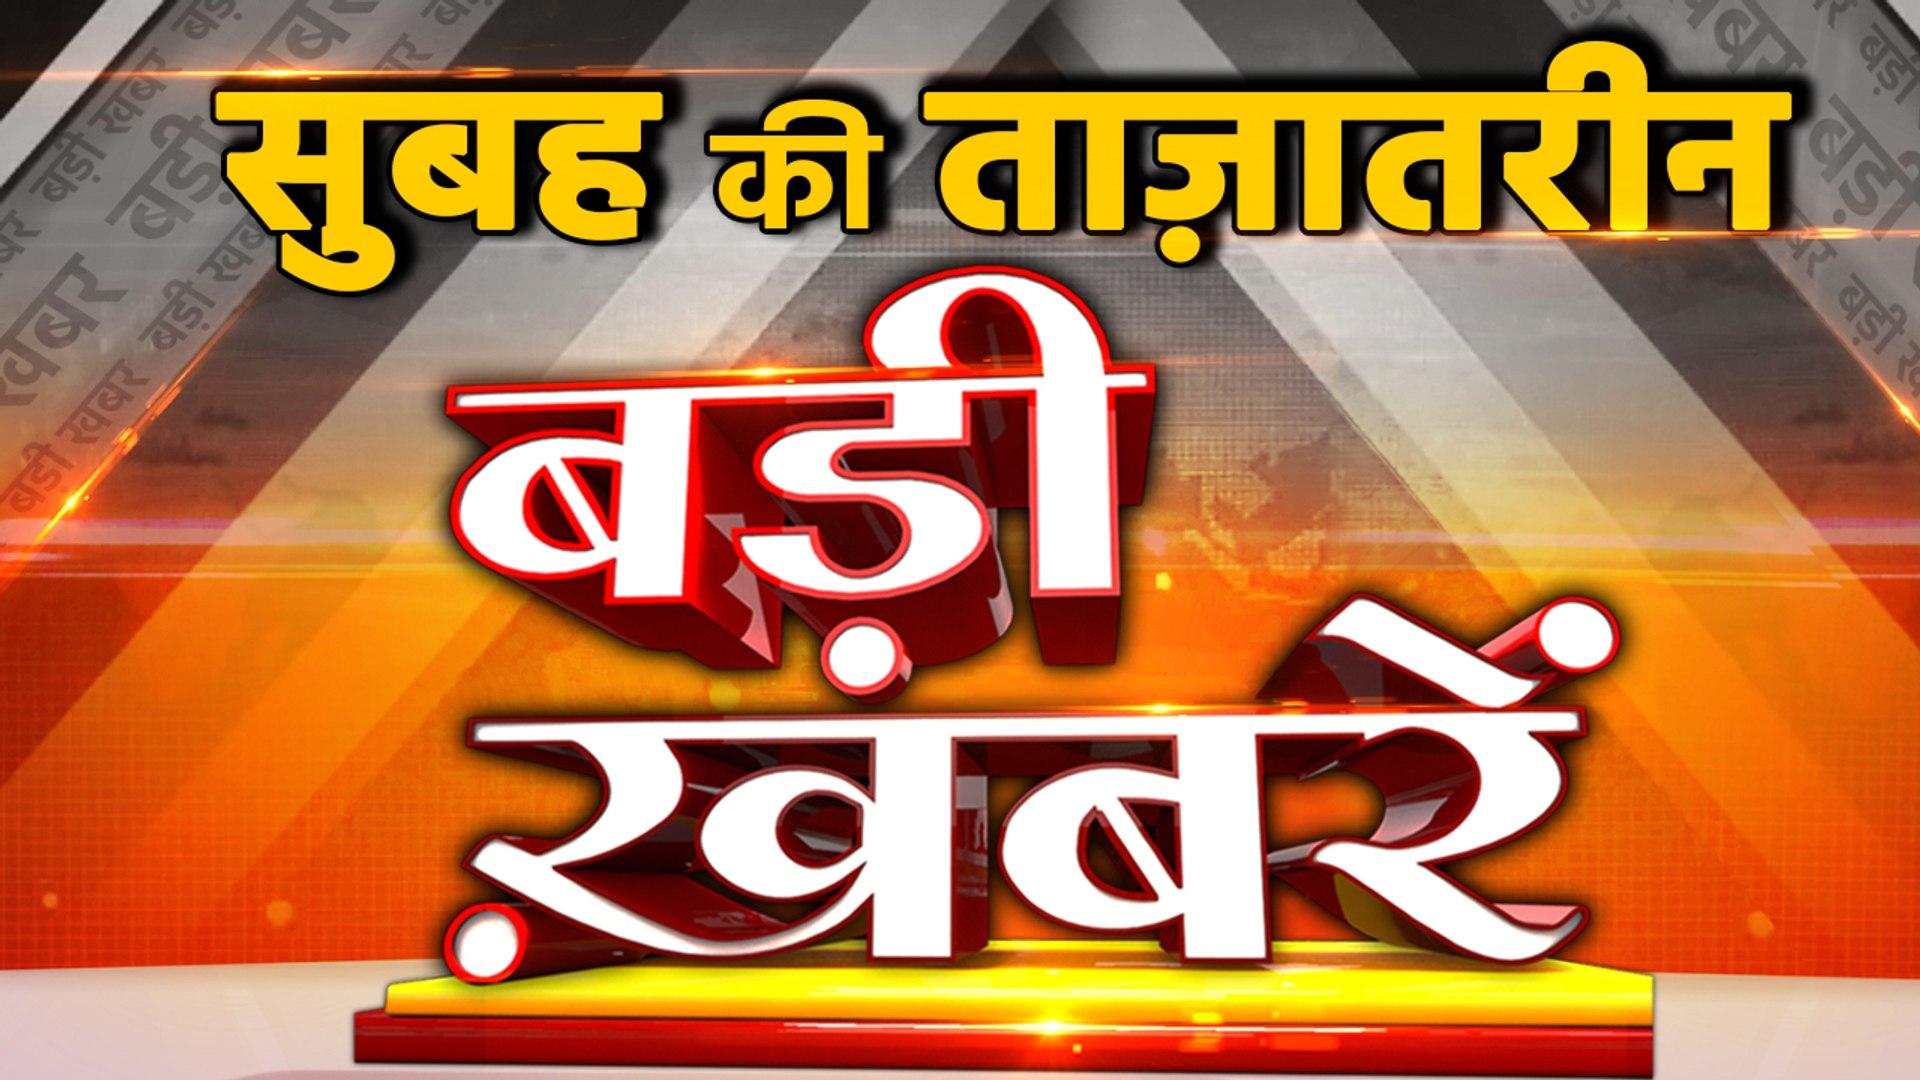 Top News | Latest News | Badi Khabar | Top Headlines | 27 December India Top News | वनइंडिया हिंदी